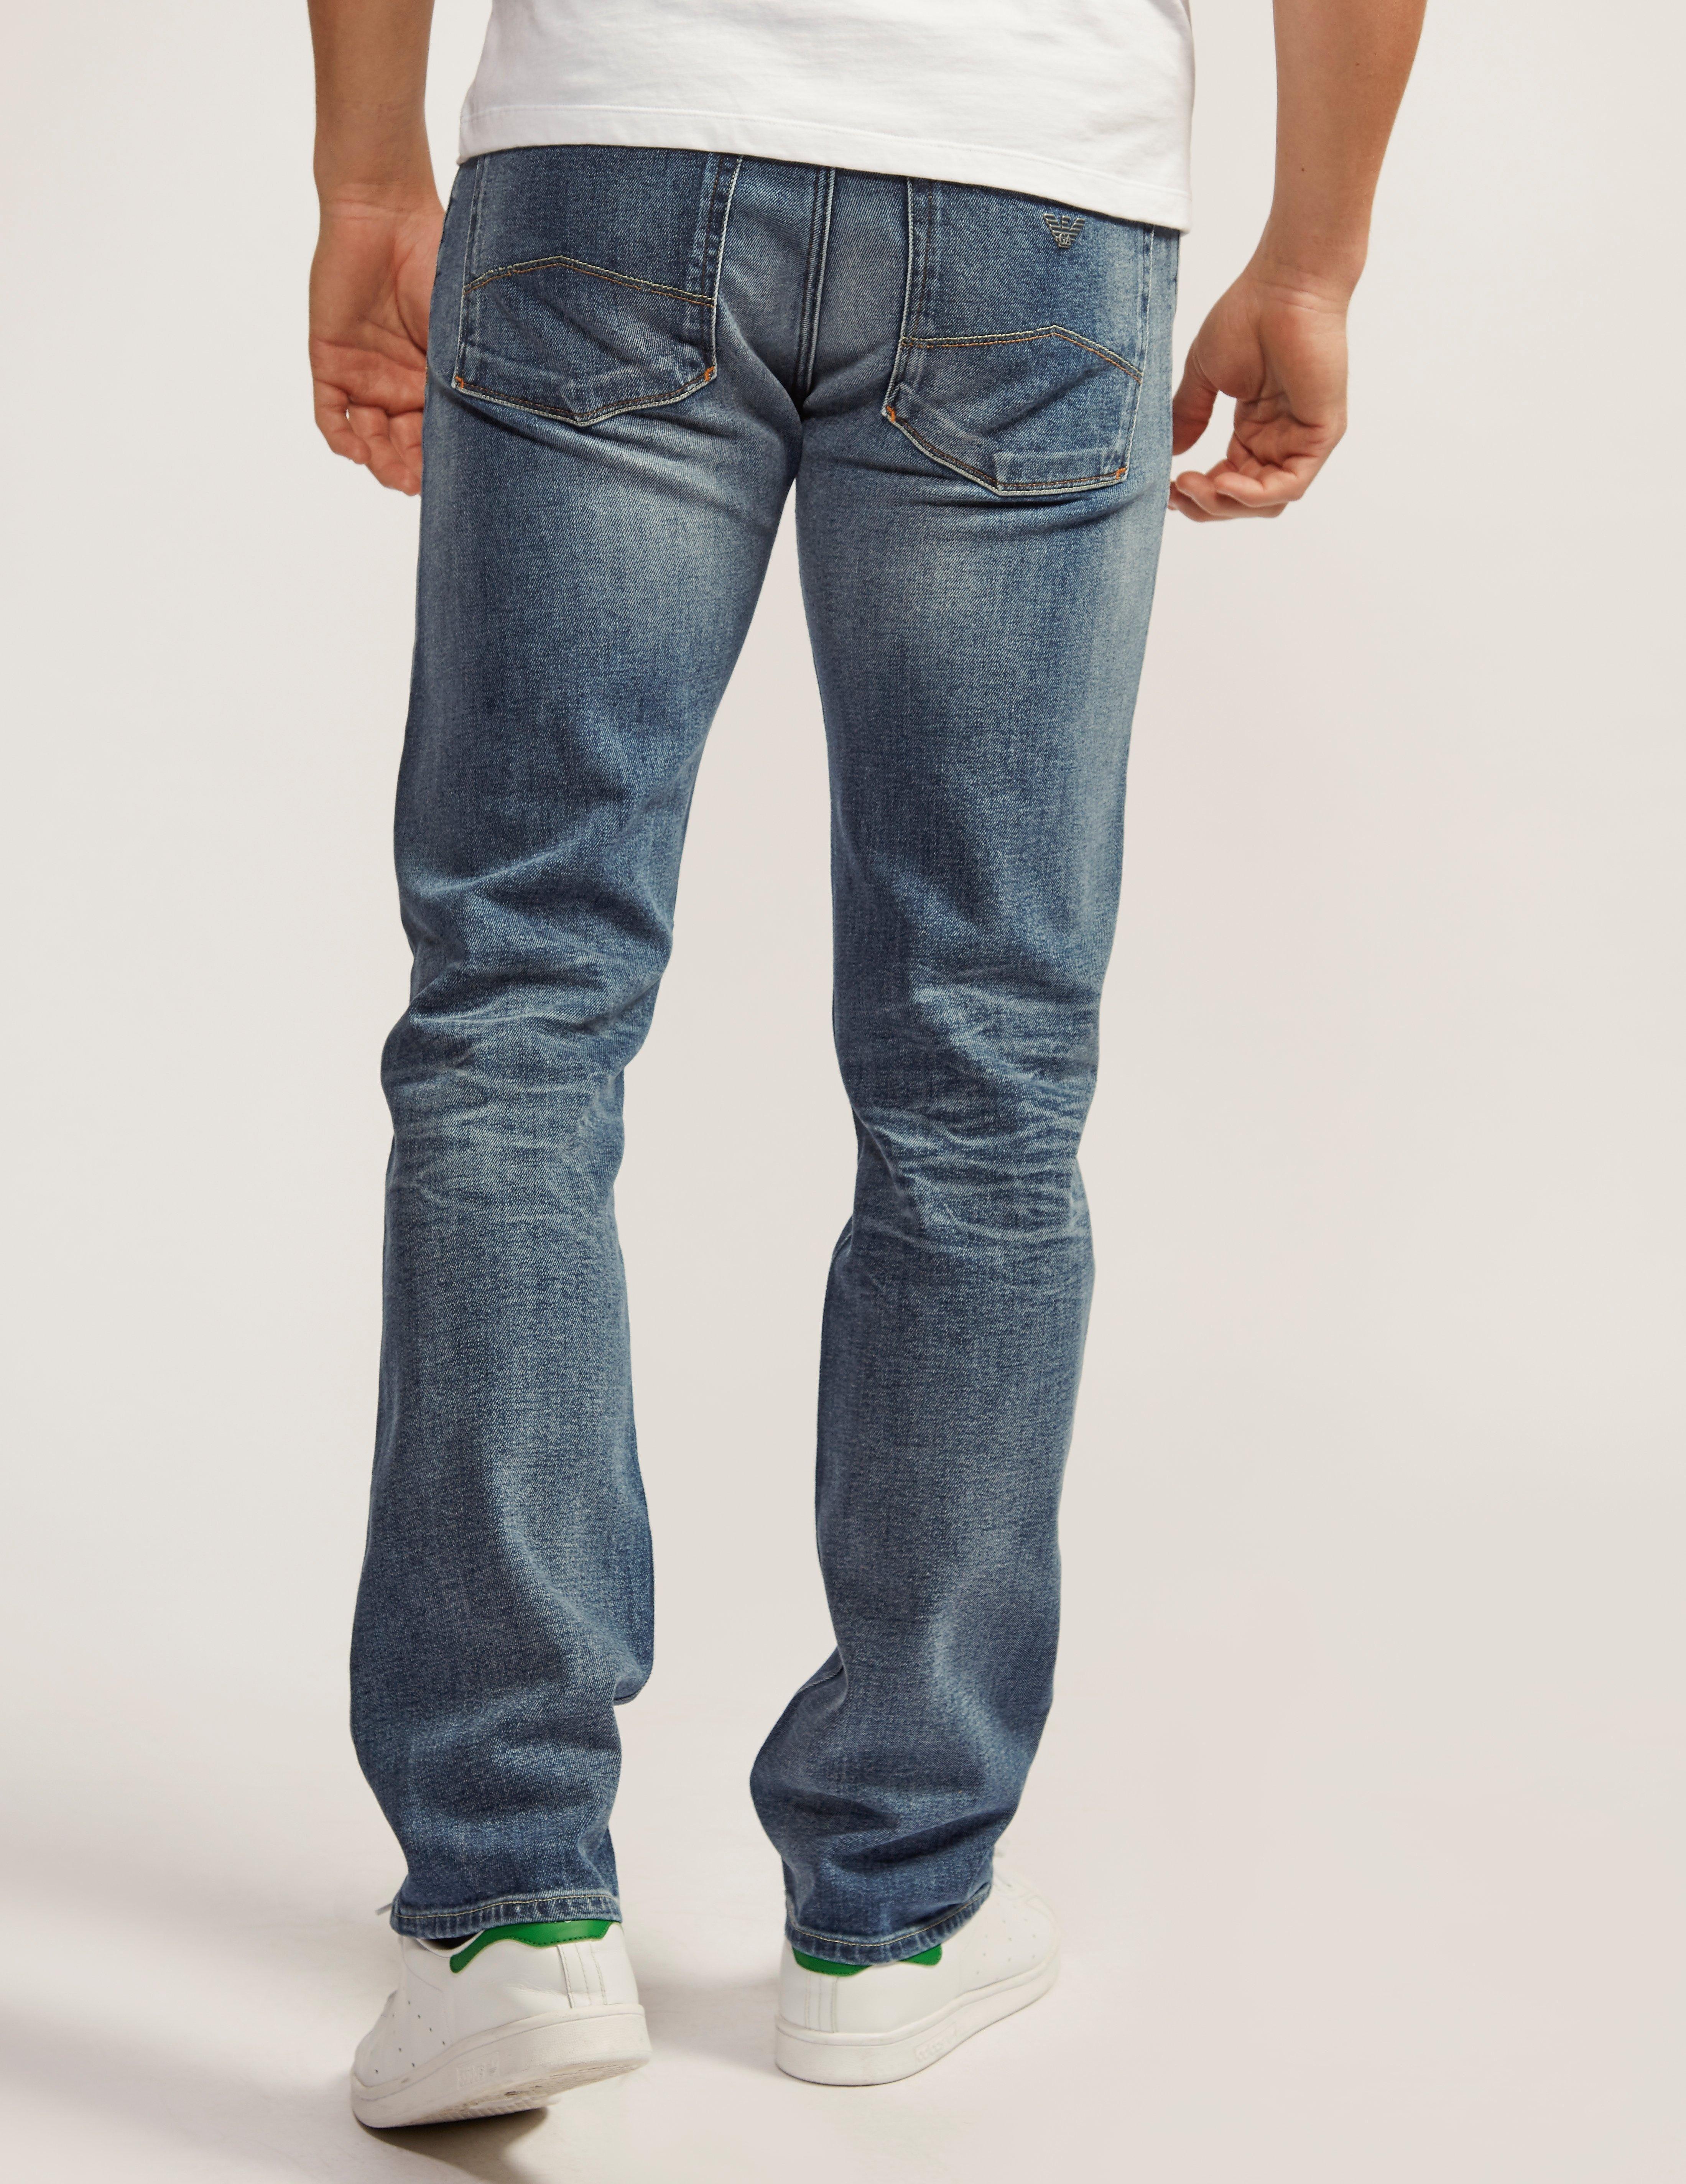 Armani Jeans J45 Straight Leg Regular Fit Jeans